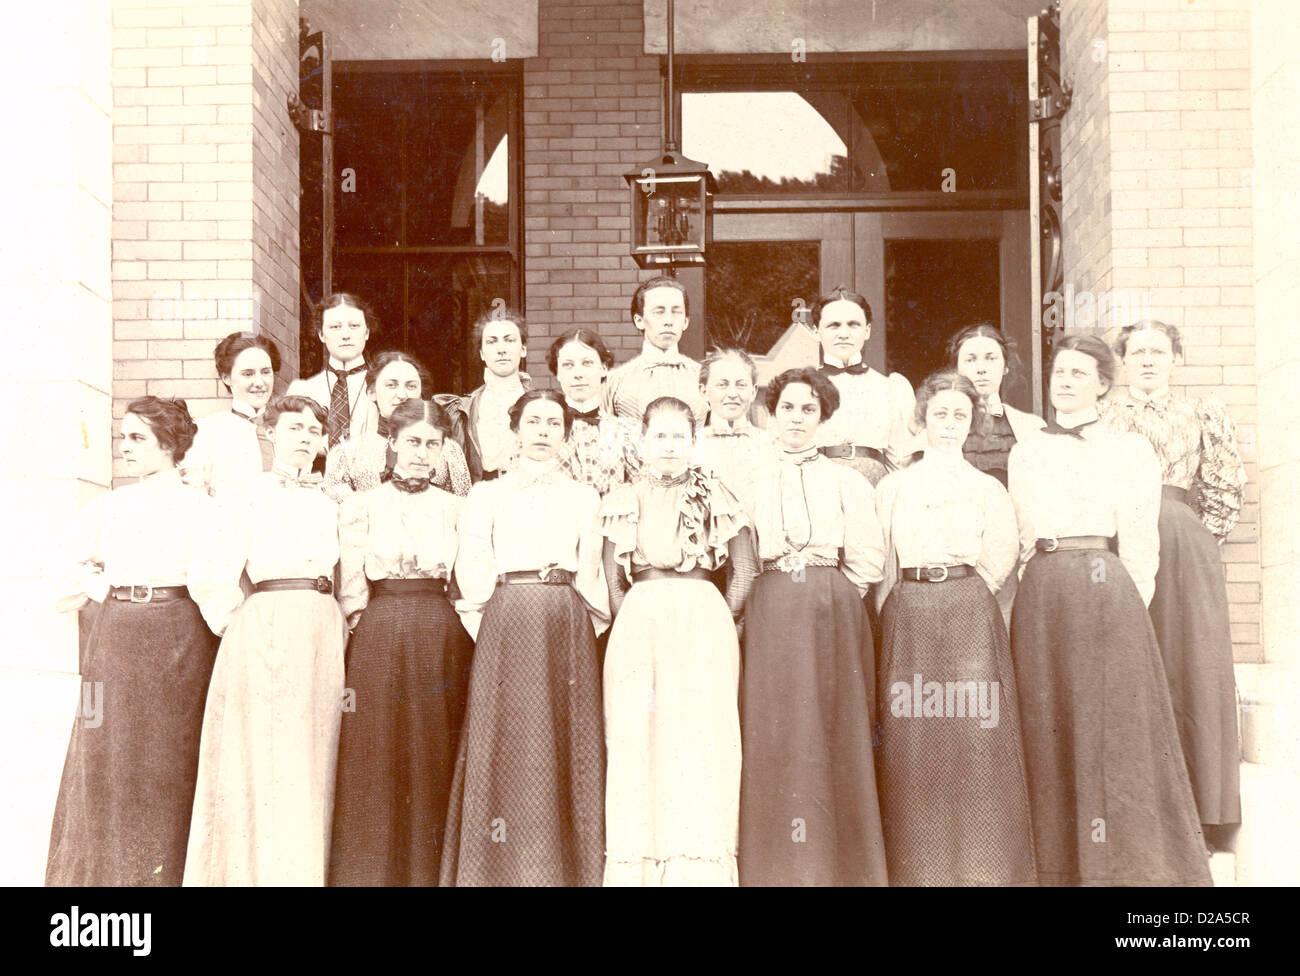 Massachusetts, North Adams Normal School Glee Club Group Portrait. Class Of 1897. - Stock Image